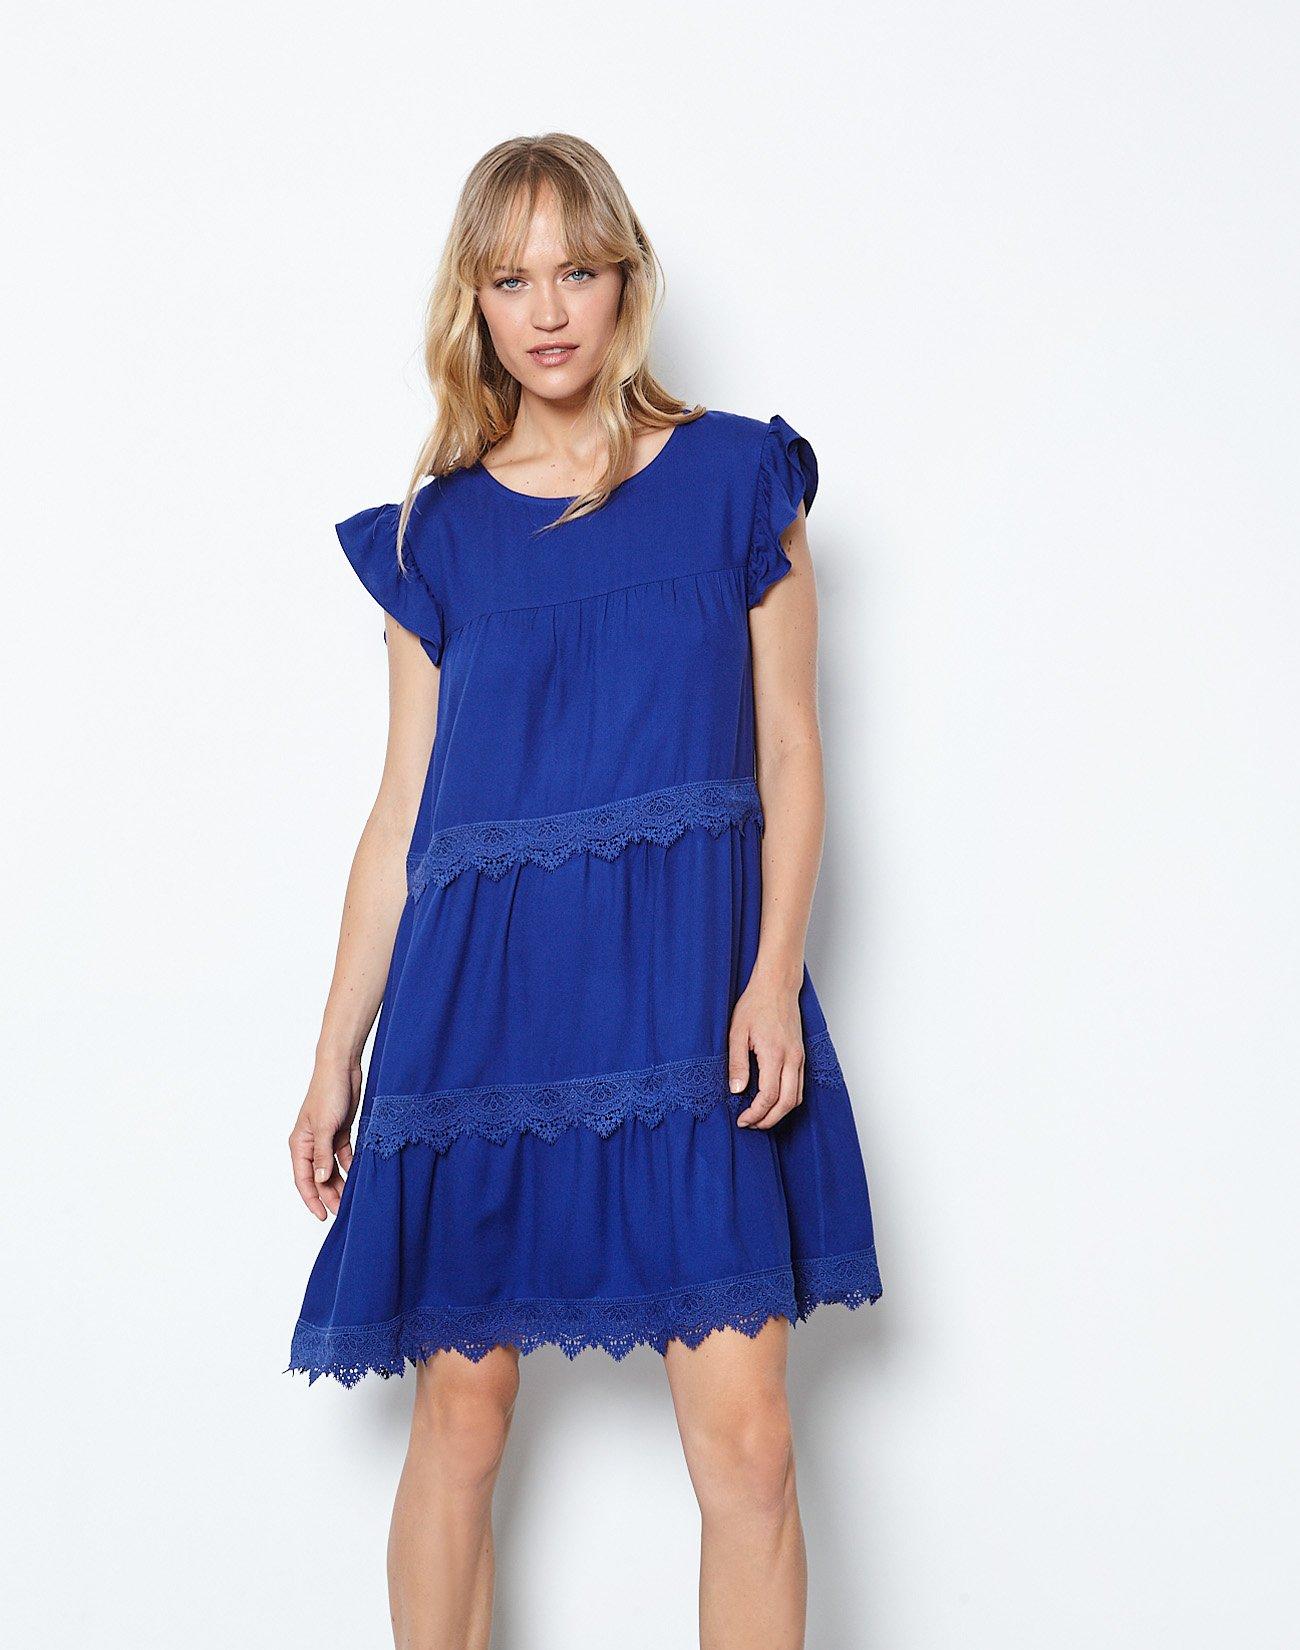 Mini dress with lace